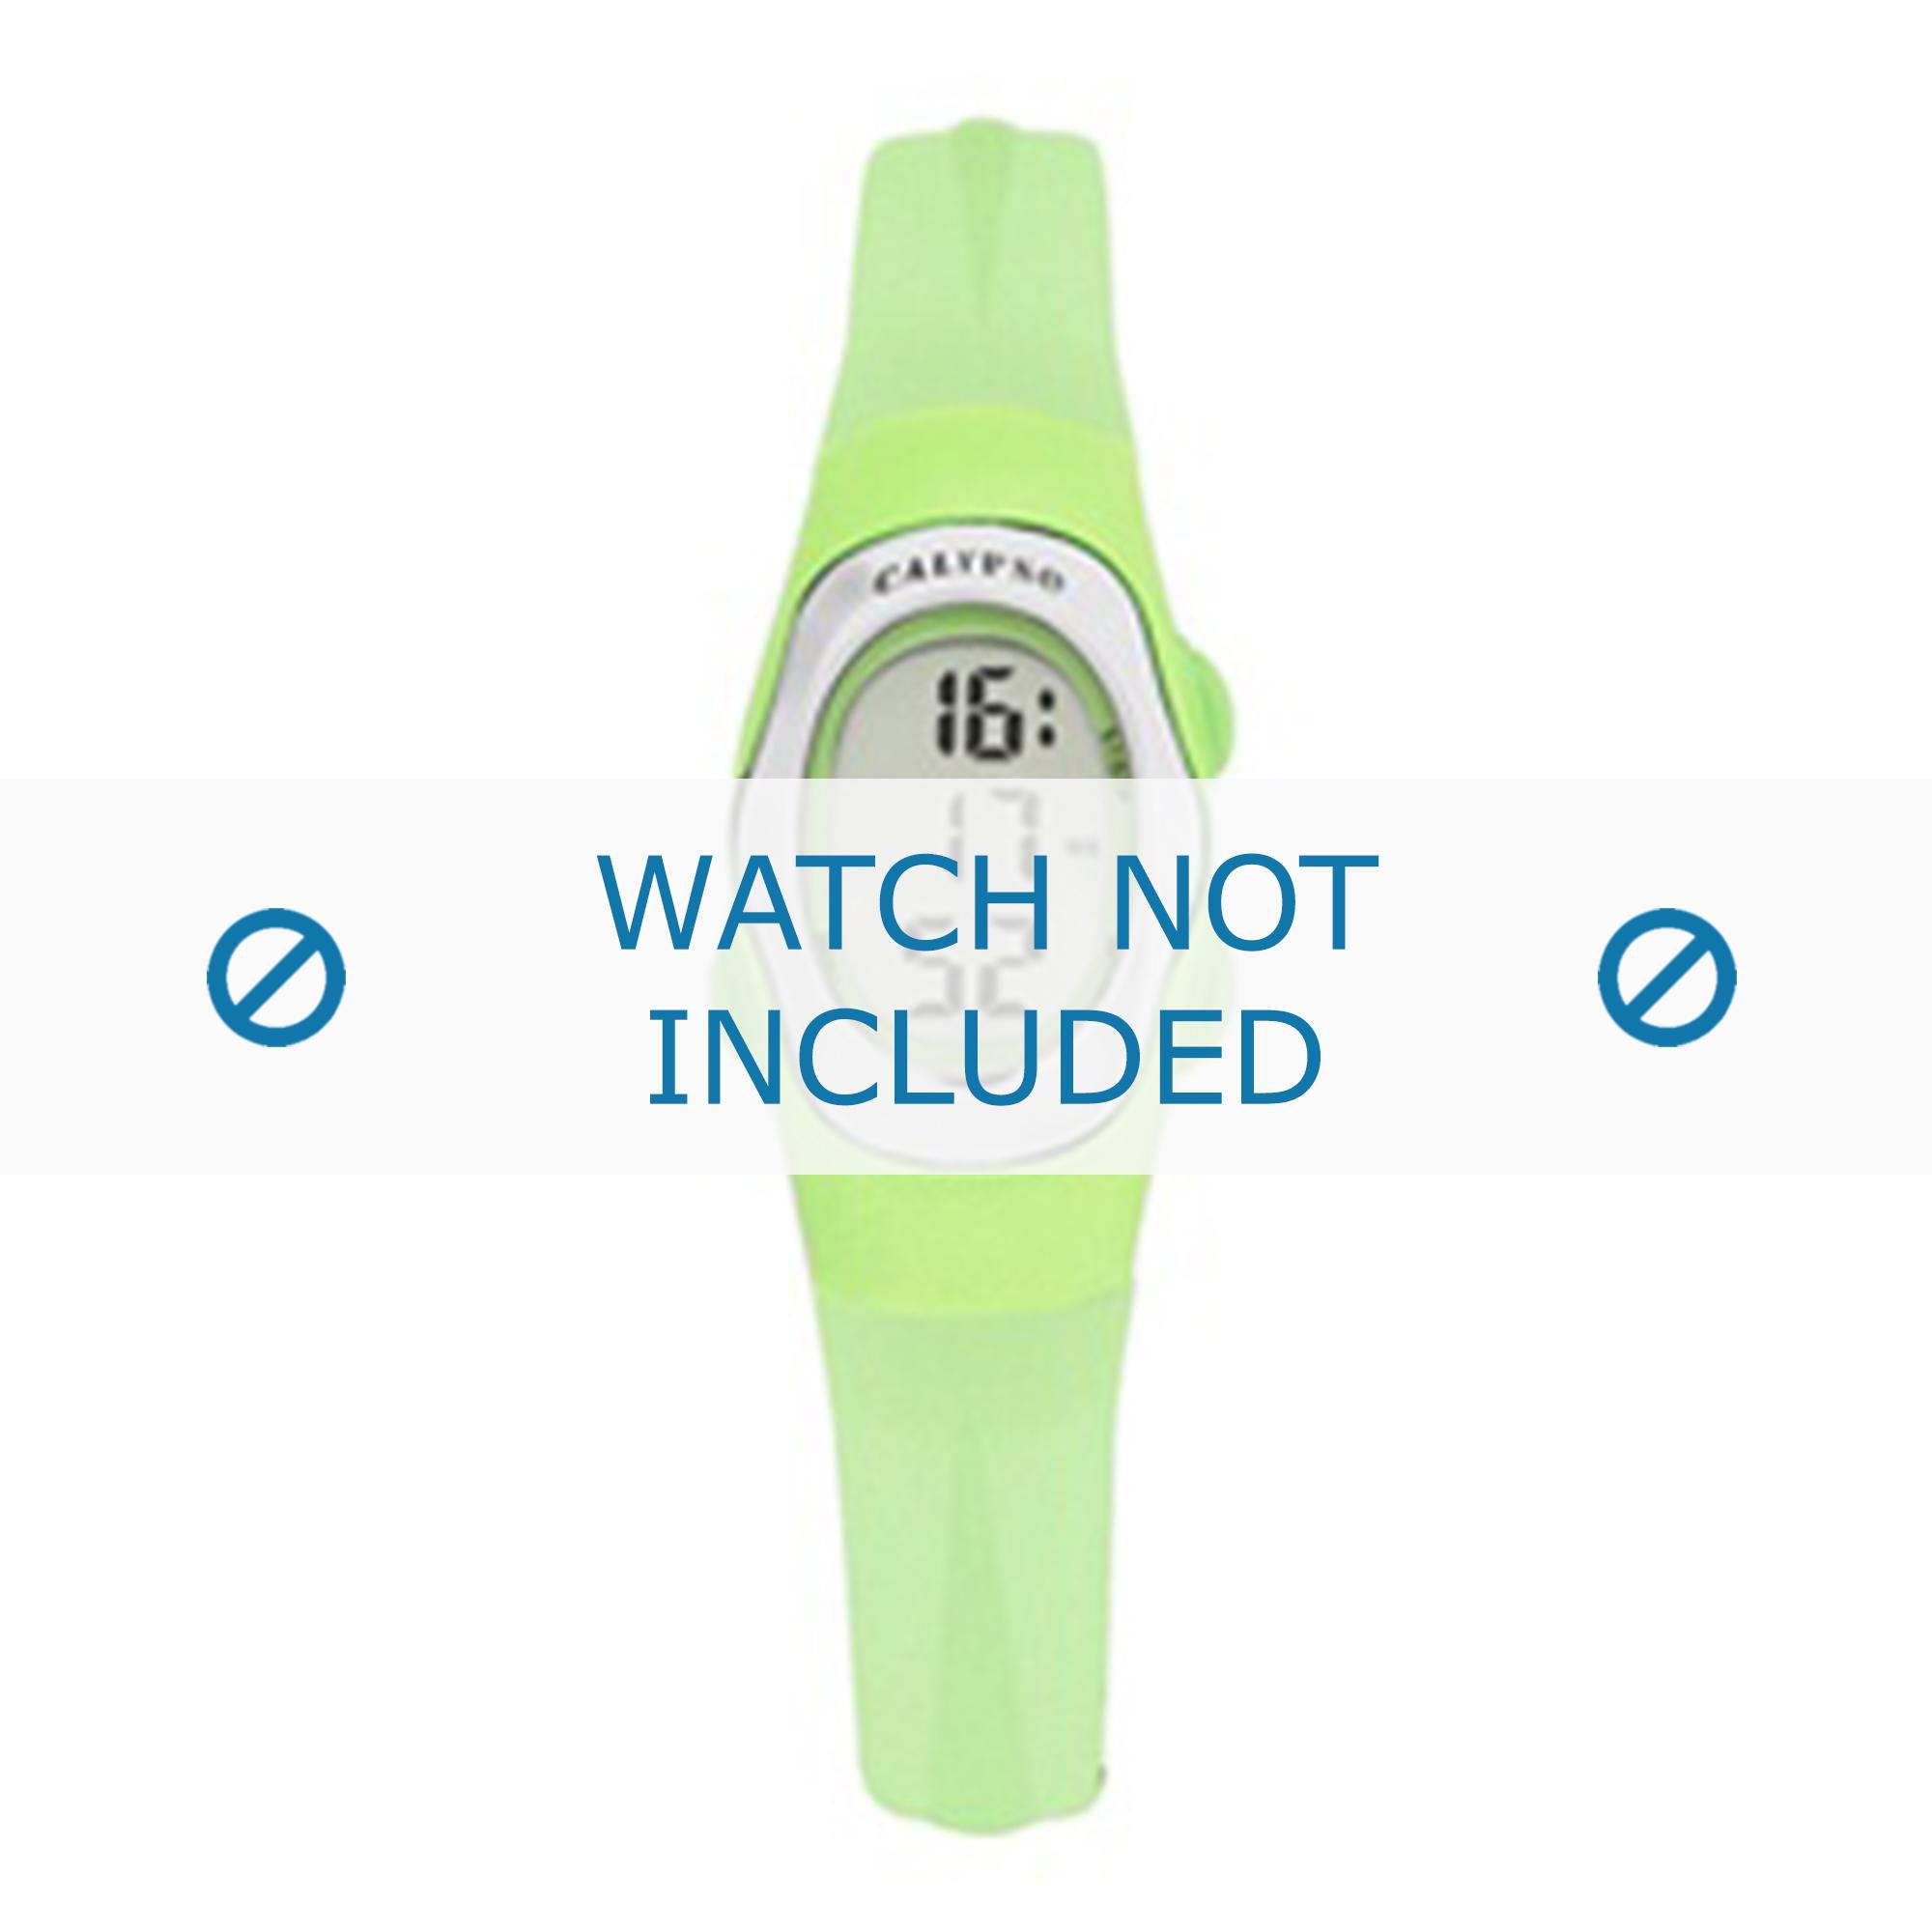 Calypso klockarmband K6018-9 Gummi Grön